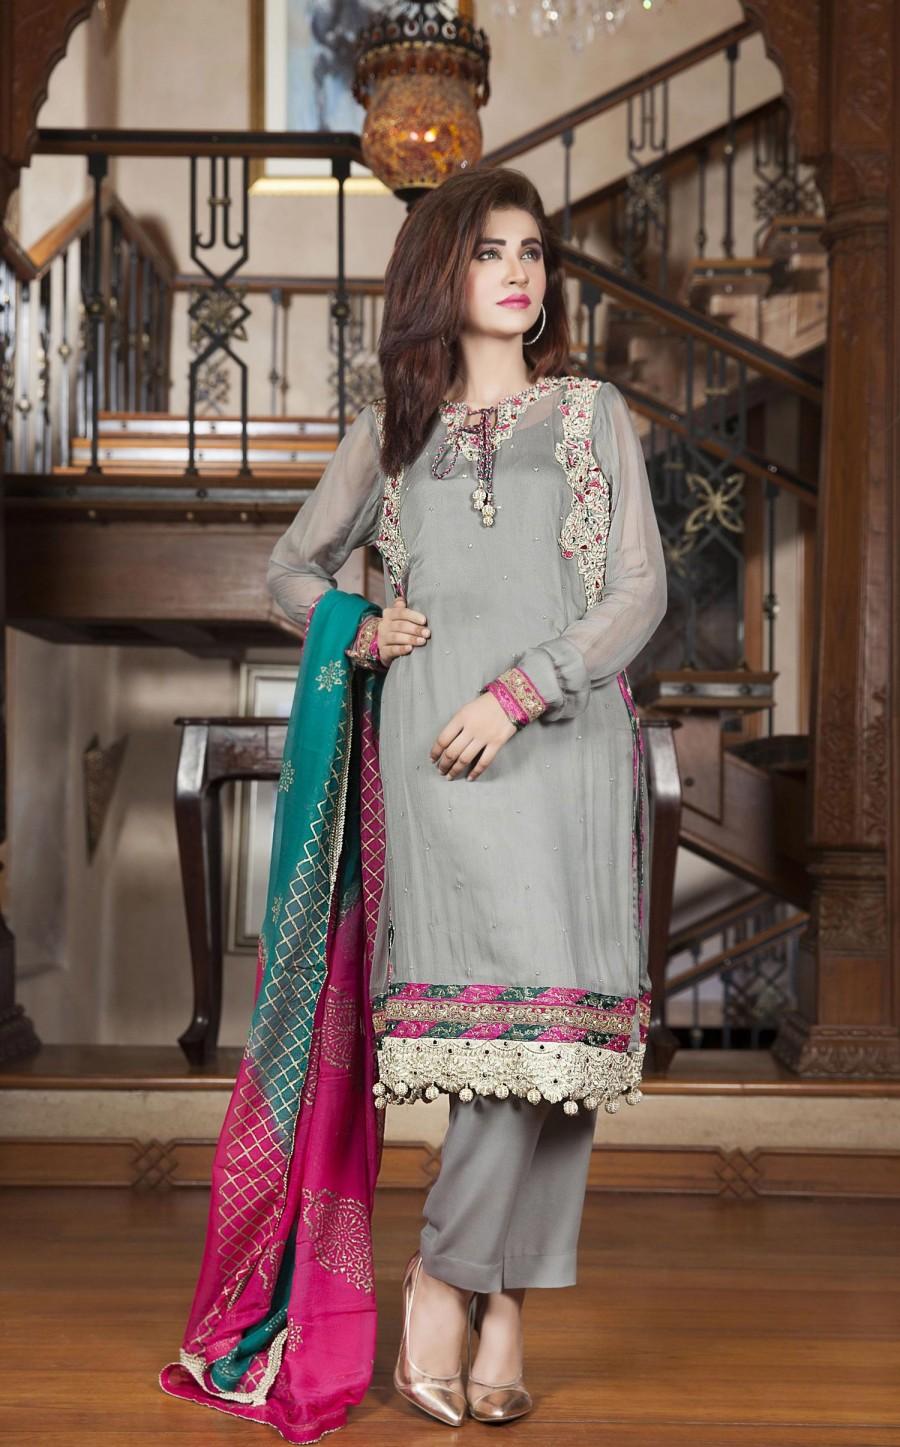 Chiffon Grey Color Exclusive Party Dress - Exclusive Online Boutique